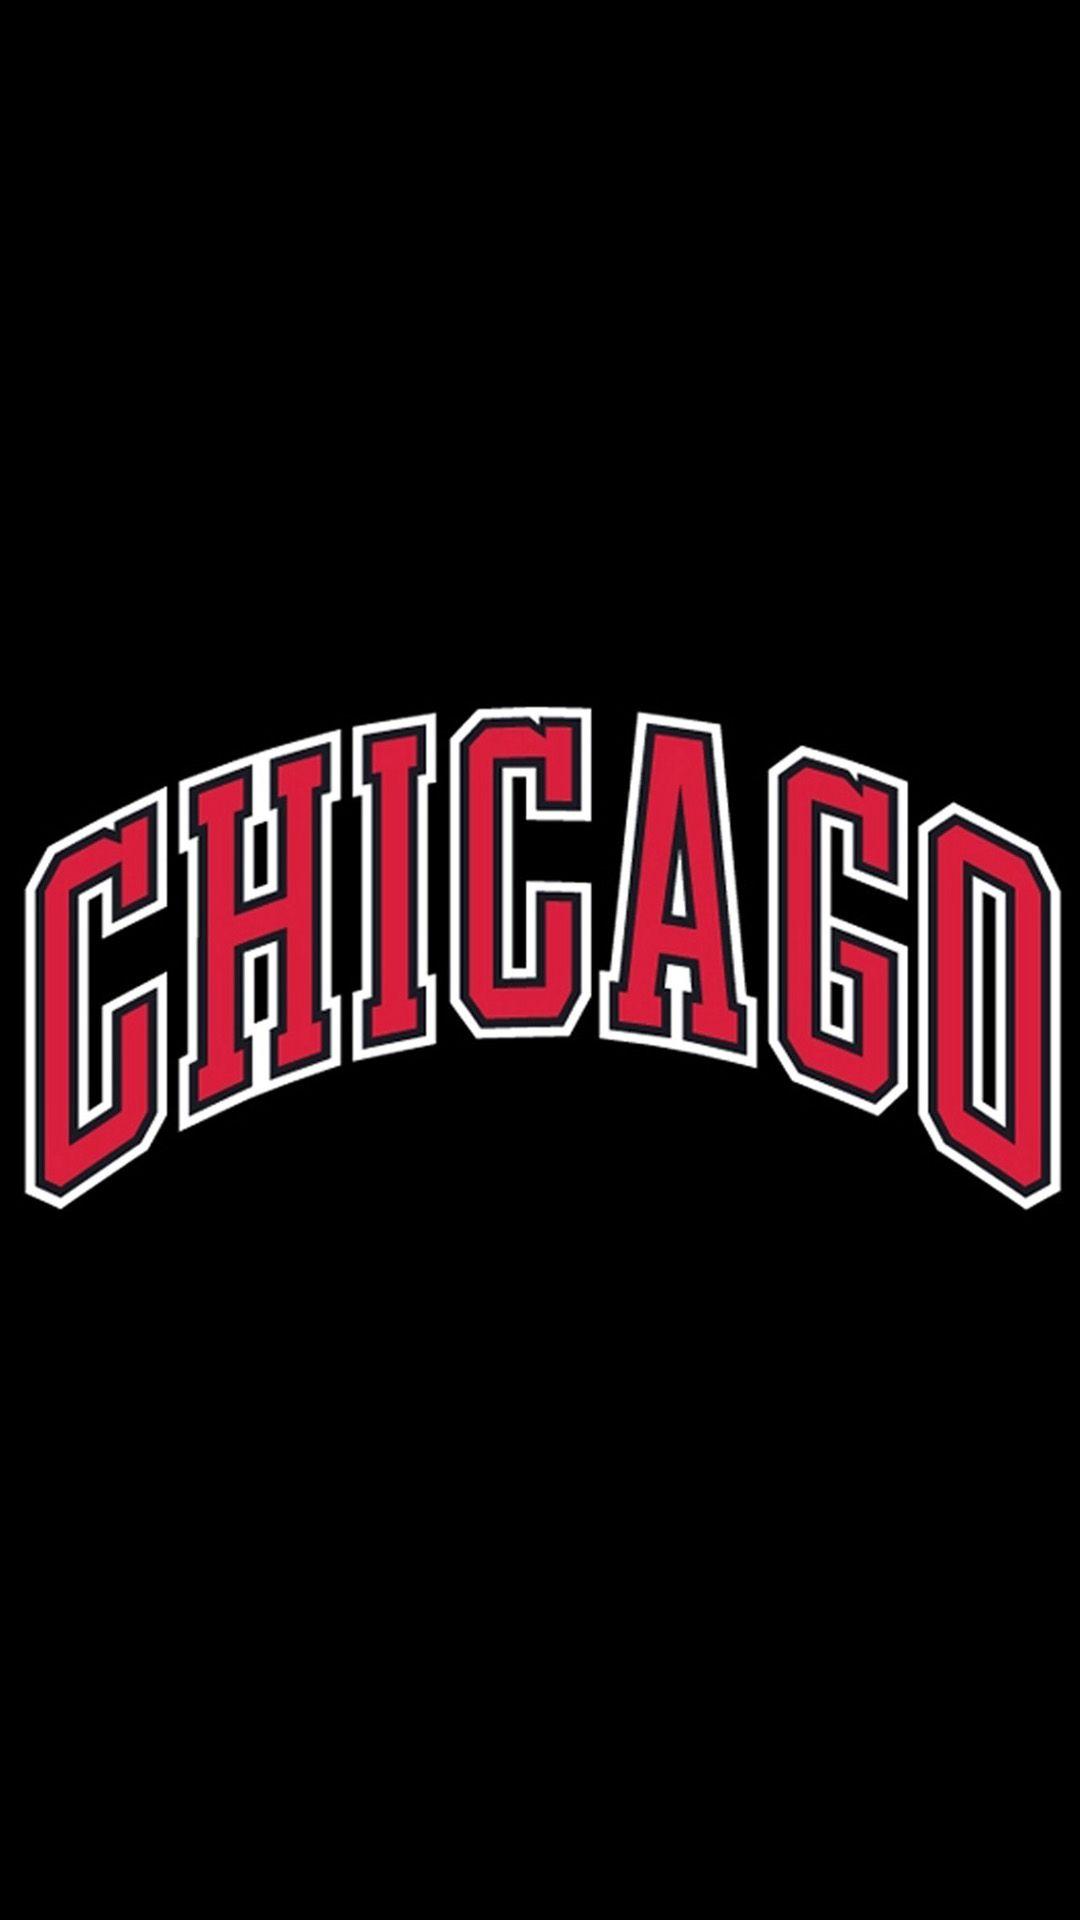 Chicago Bulls Iphone Wallpaper.